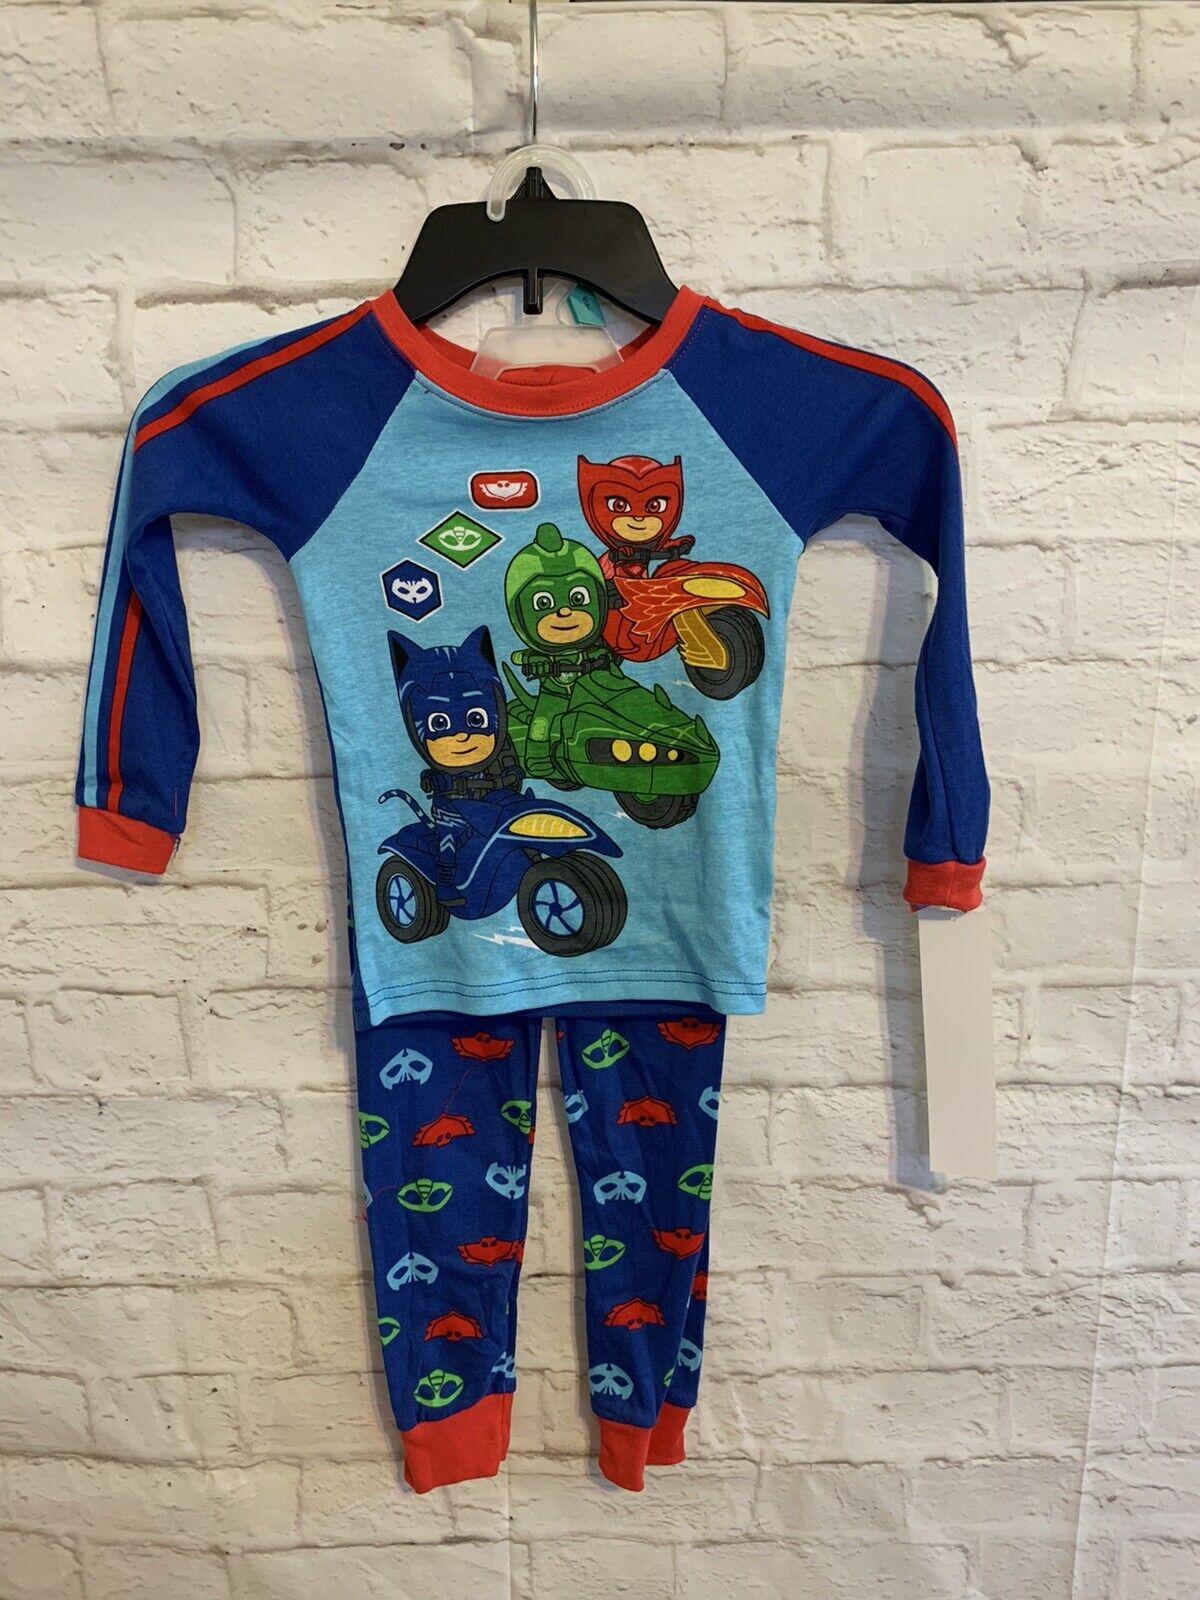 Toddler Boys PJ Masks 2Pc Pajama Set 5T